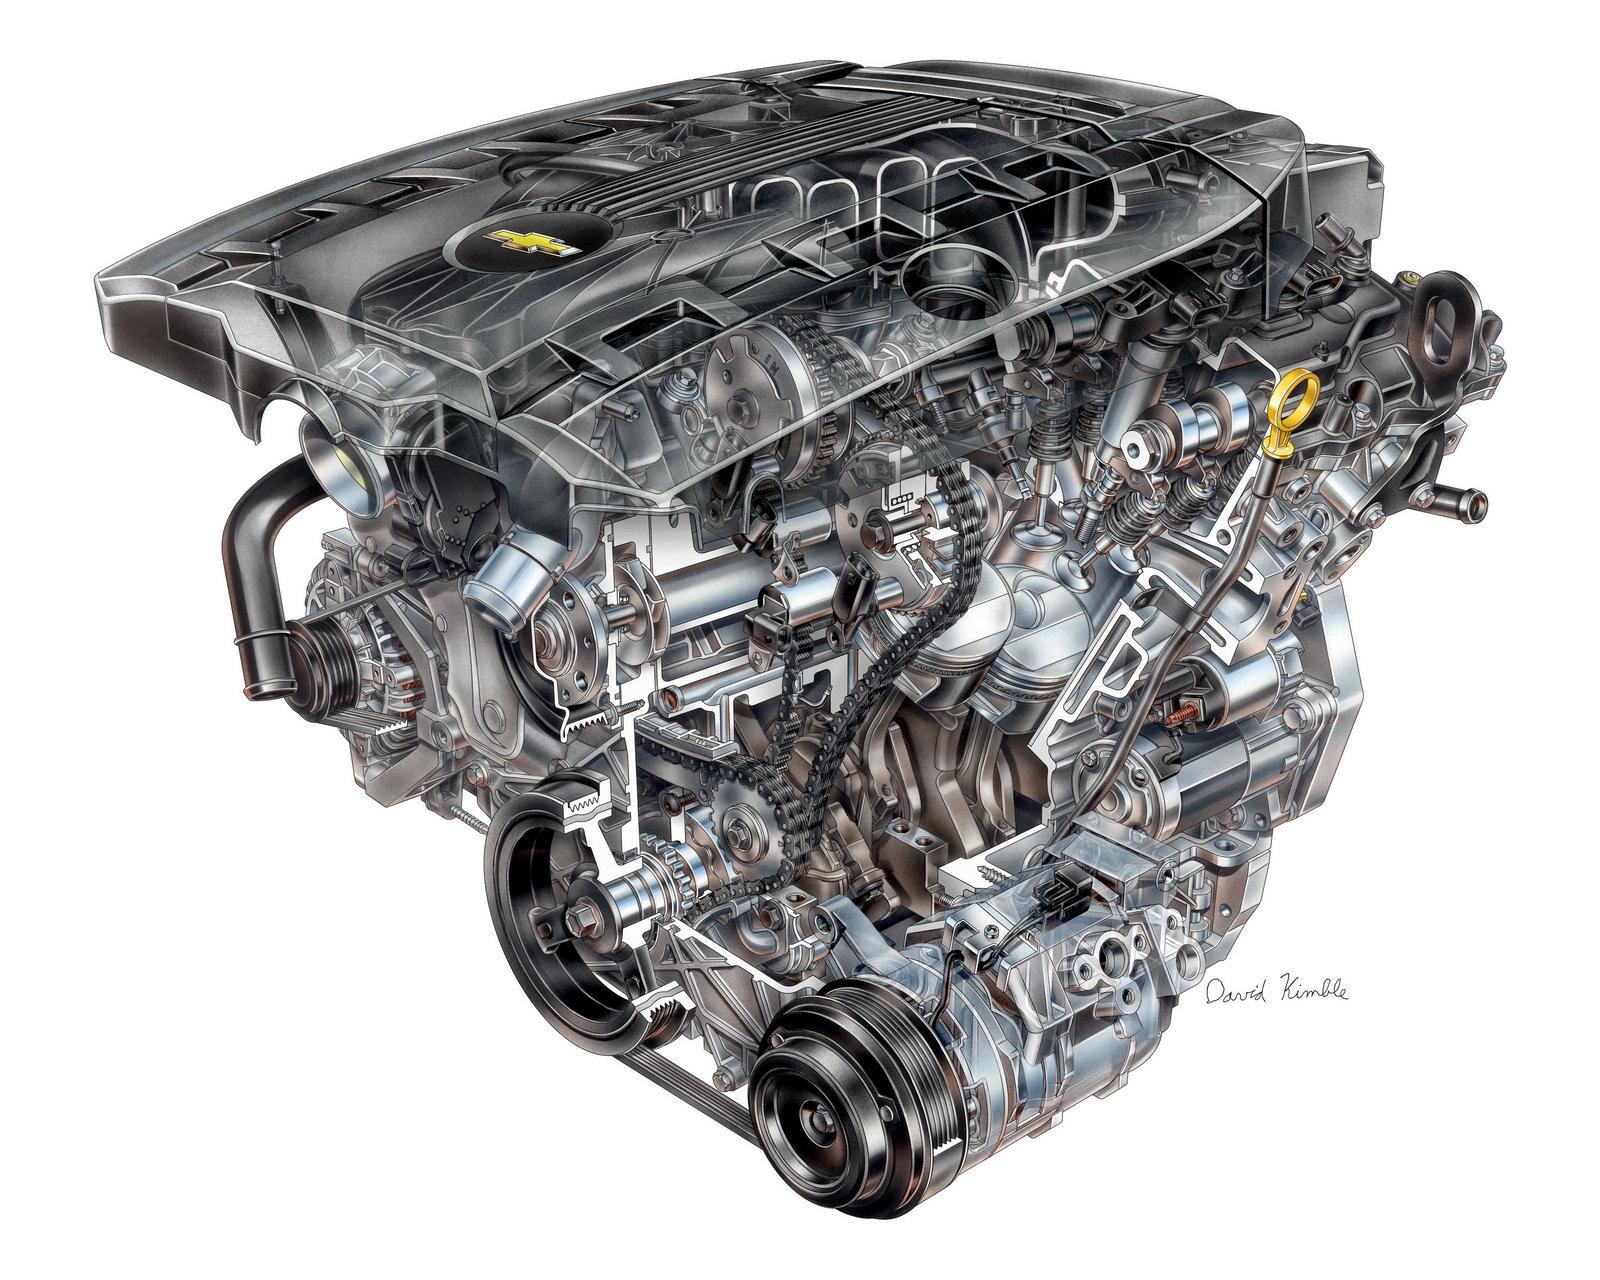 2012 Chevrolet Camaro V6 323 Hp